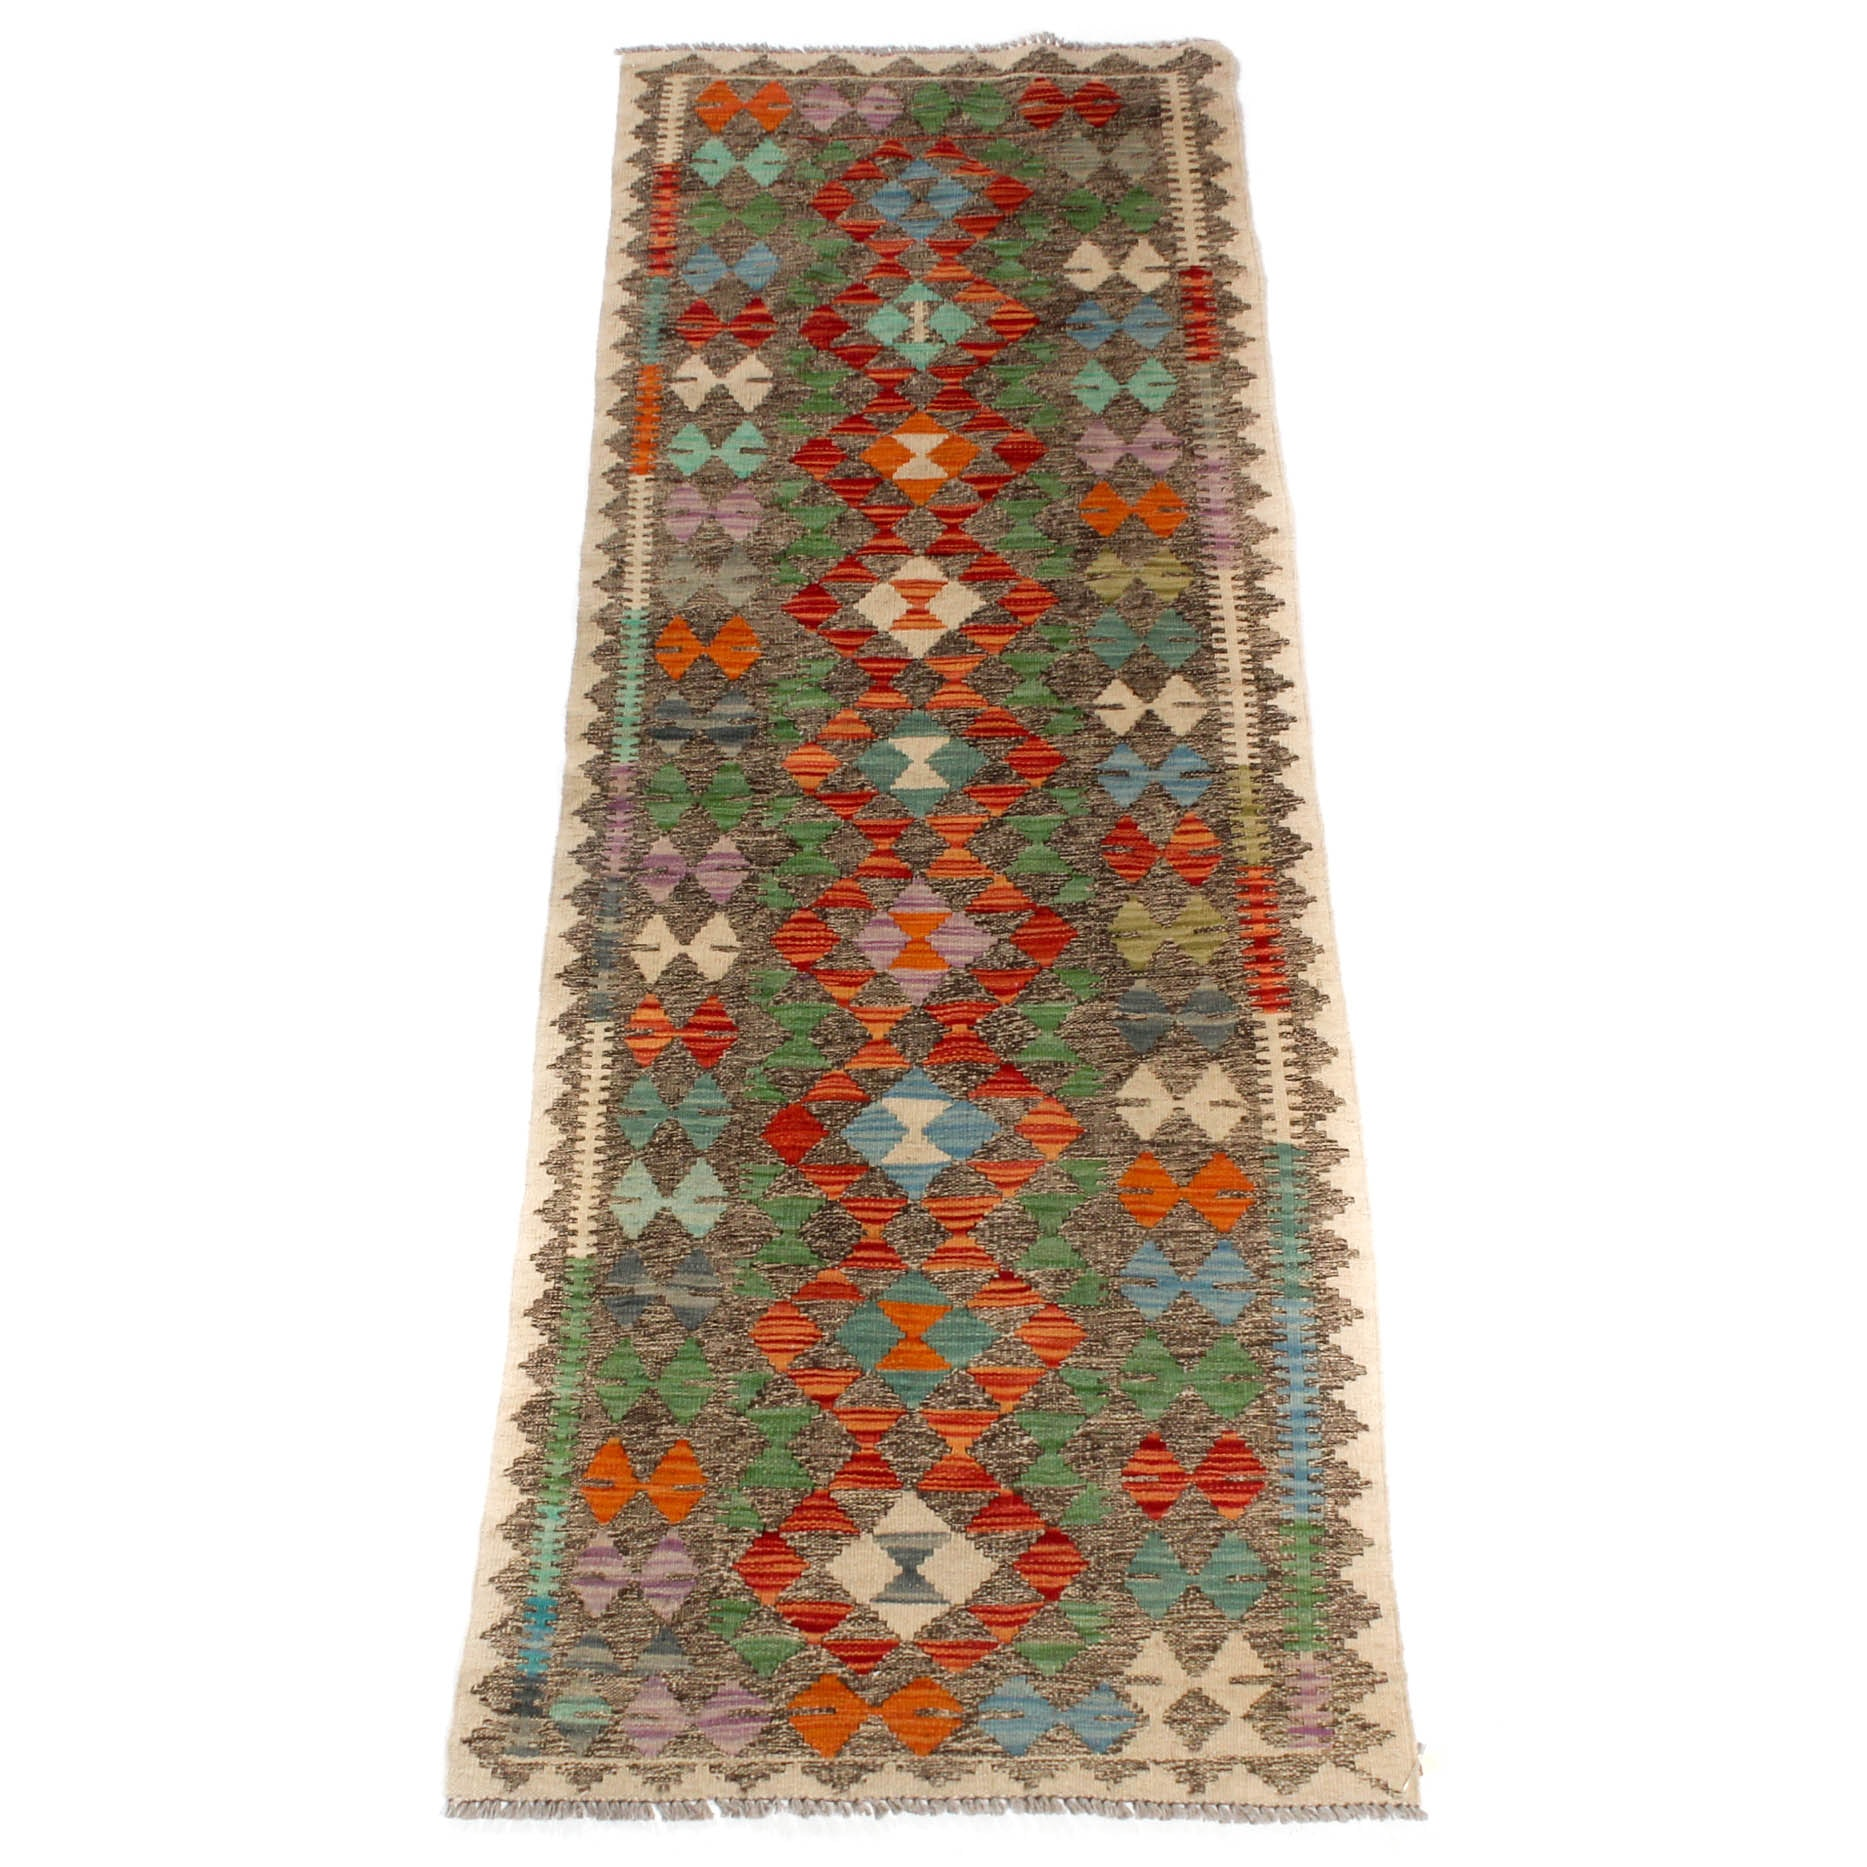 2.3' x 6.8' Hand-Knotted Turkish Kilim Carpet Runner